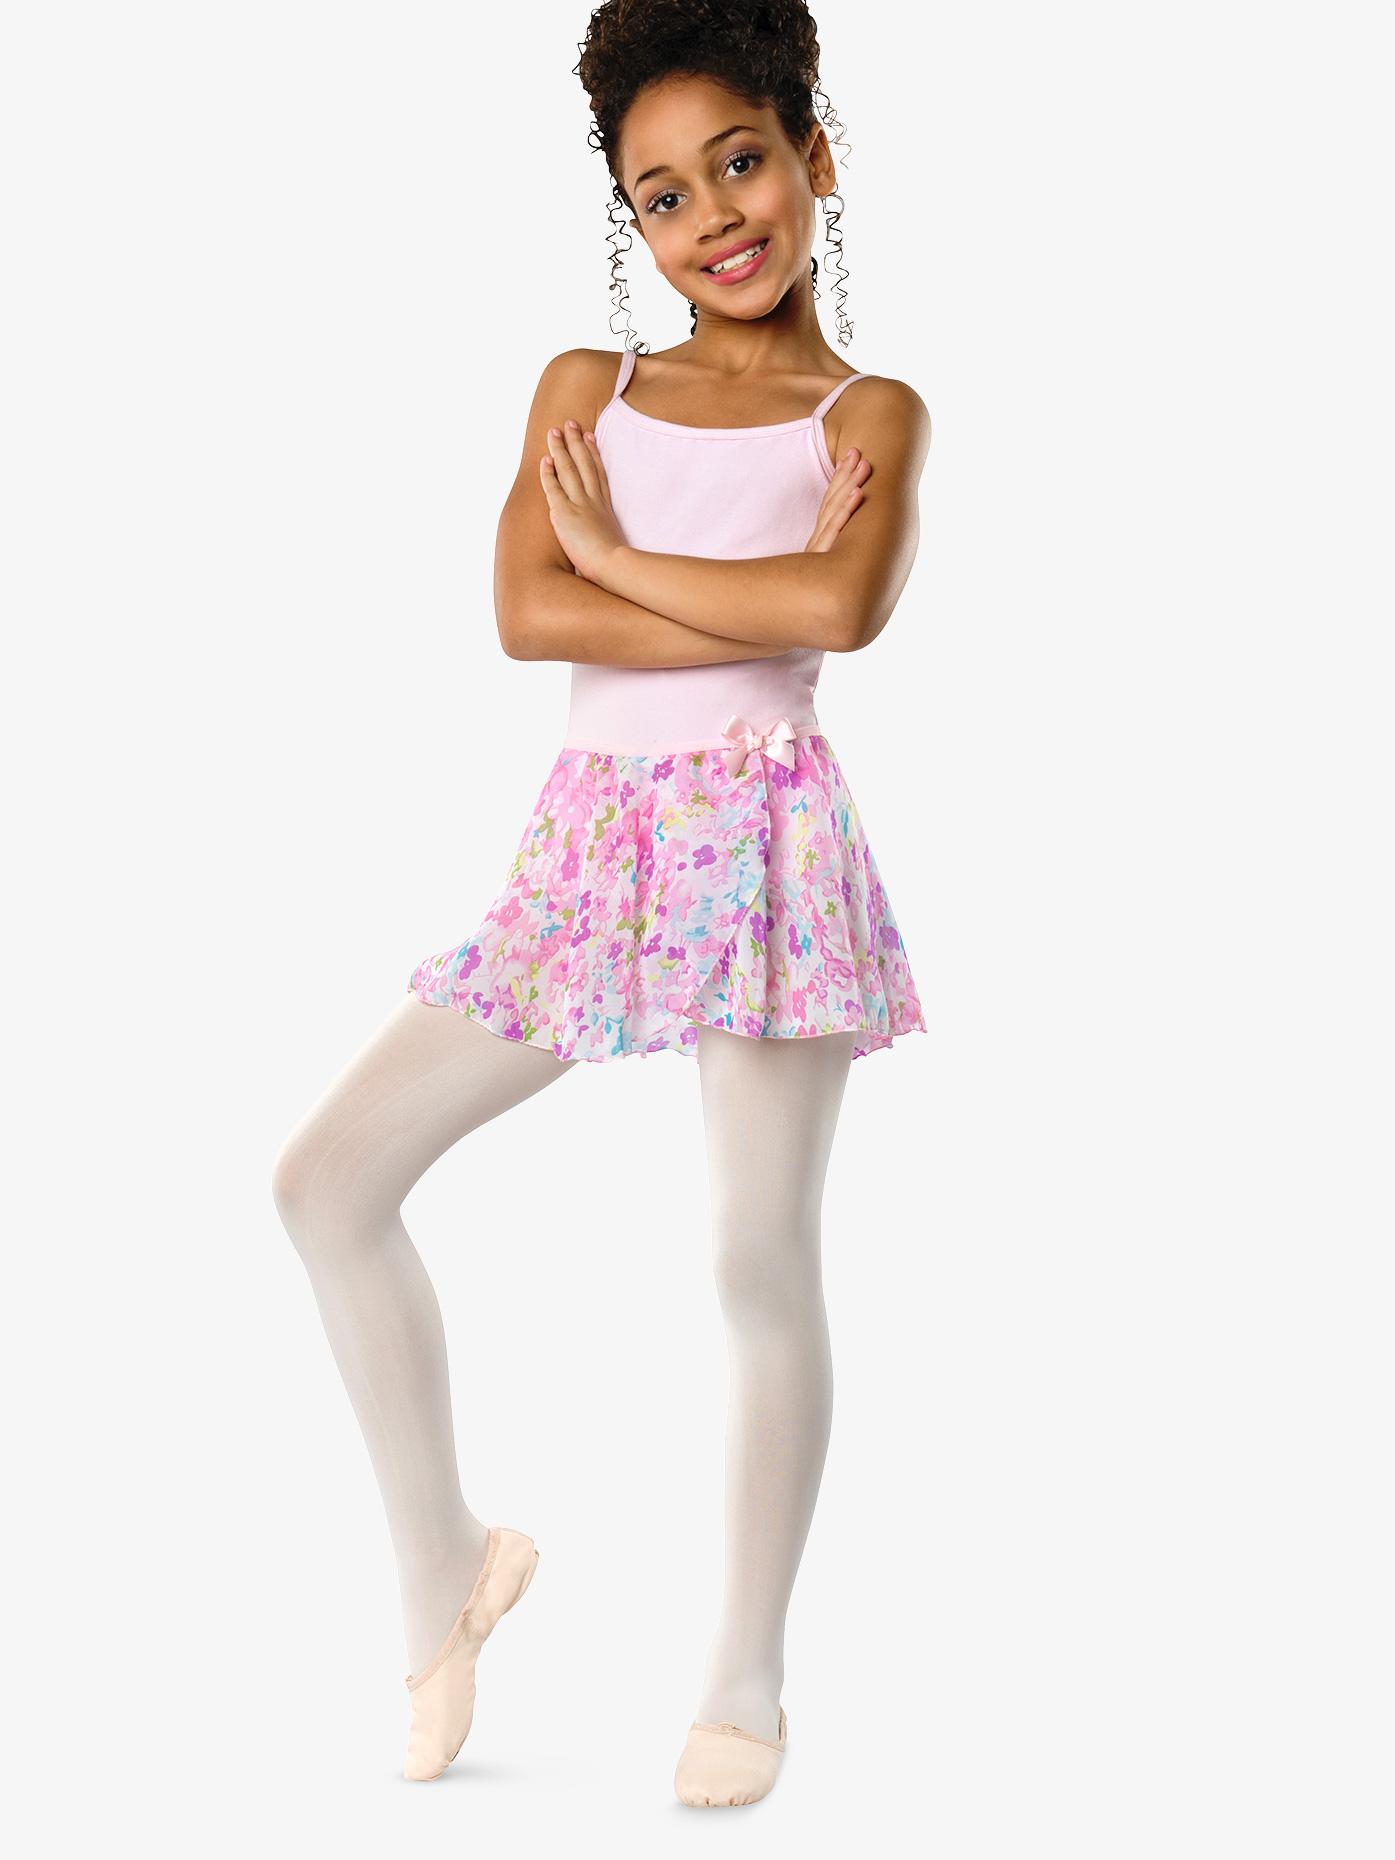 Danznmotion Girls Pastel Floral Pull-On Skirt 2605C